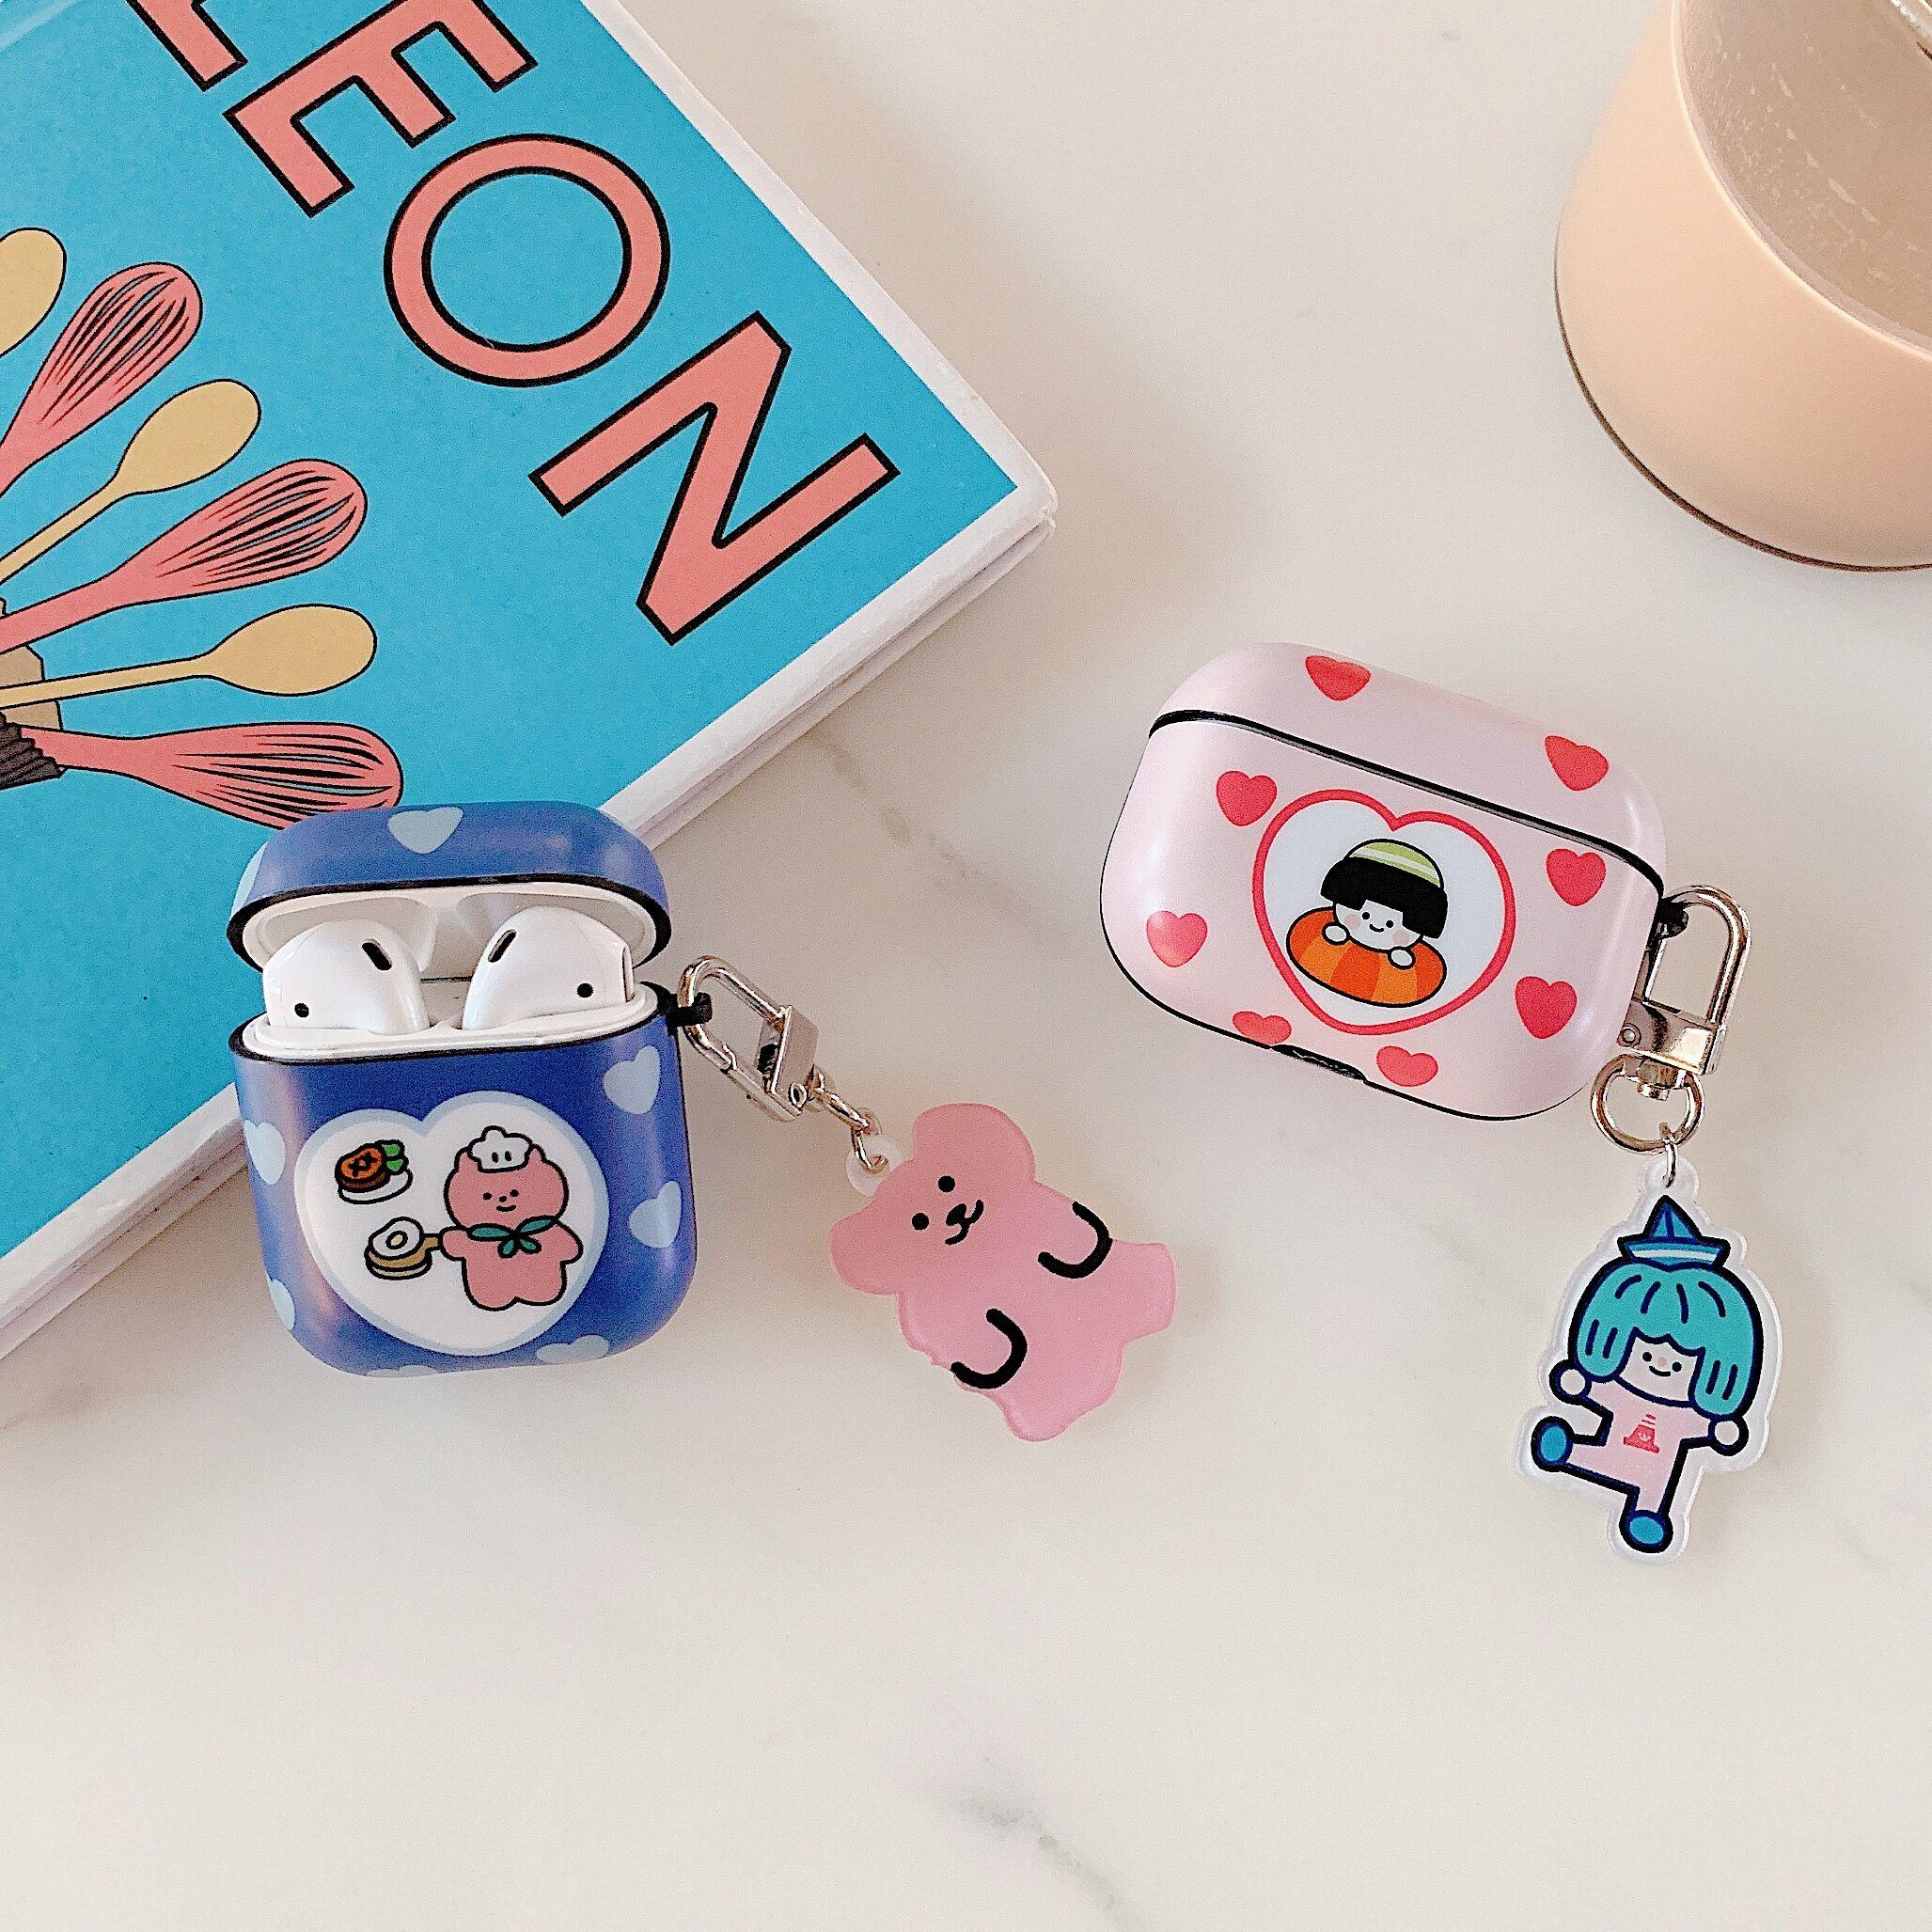 Mode Cartoon cute bear silikon Drahtlose Kopfhörer Lade fall für AirPods 1 2 3 Bluetooth abdeckung tasche box für airpods pro